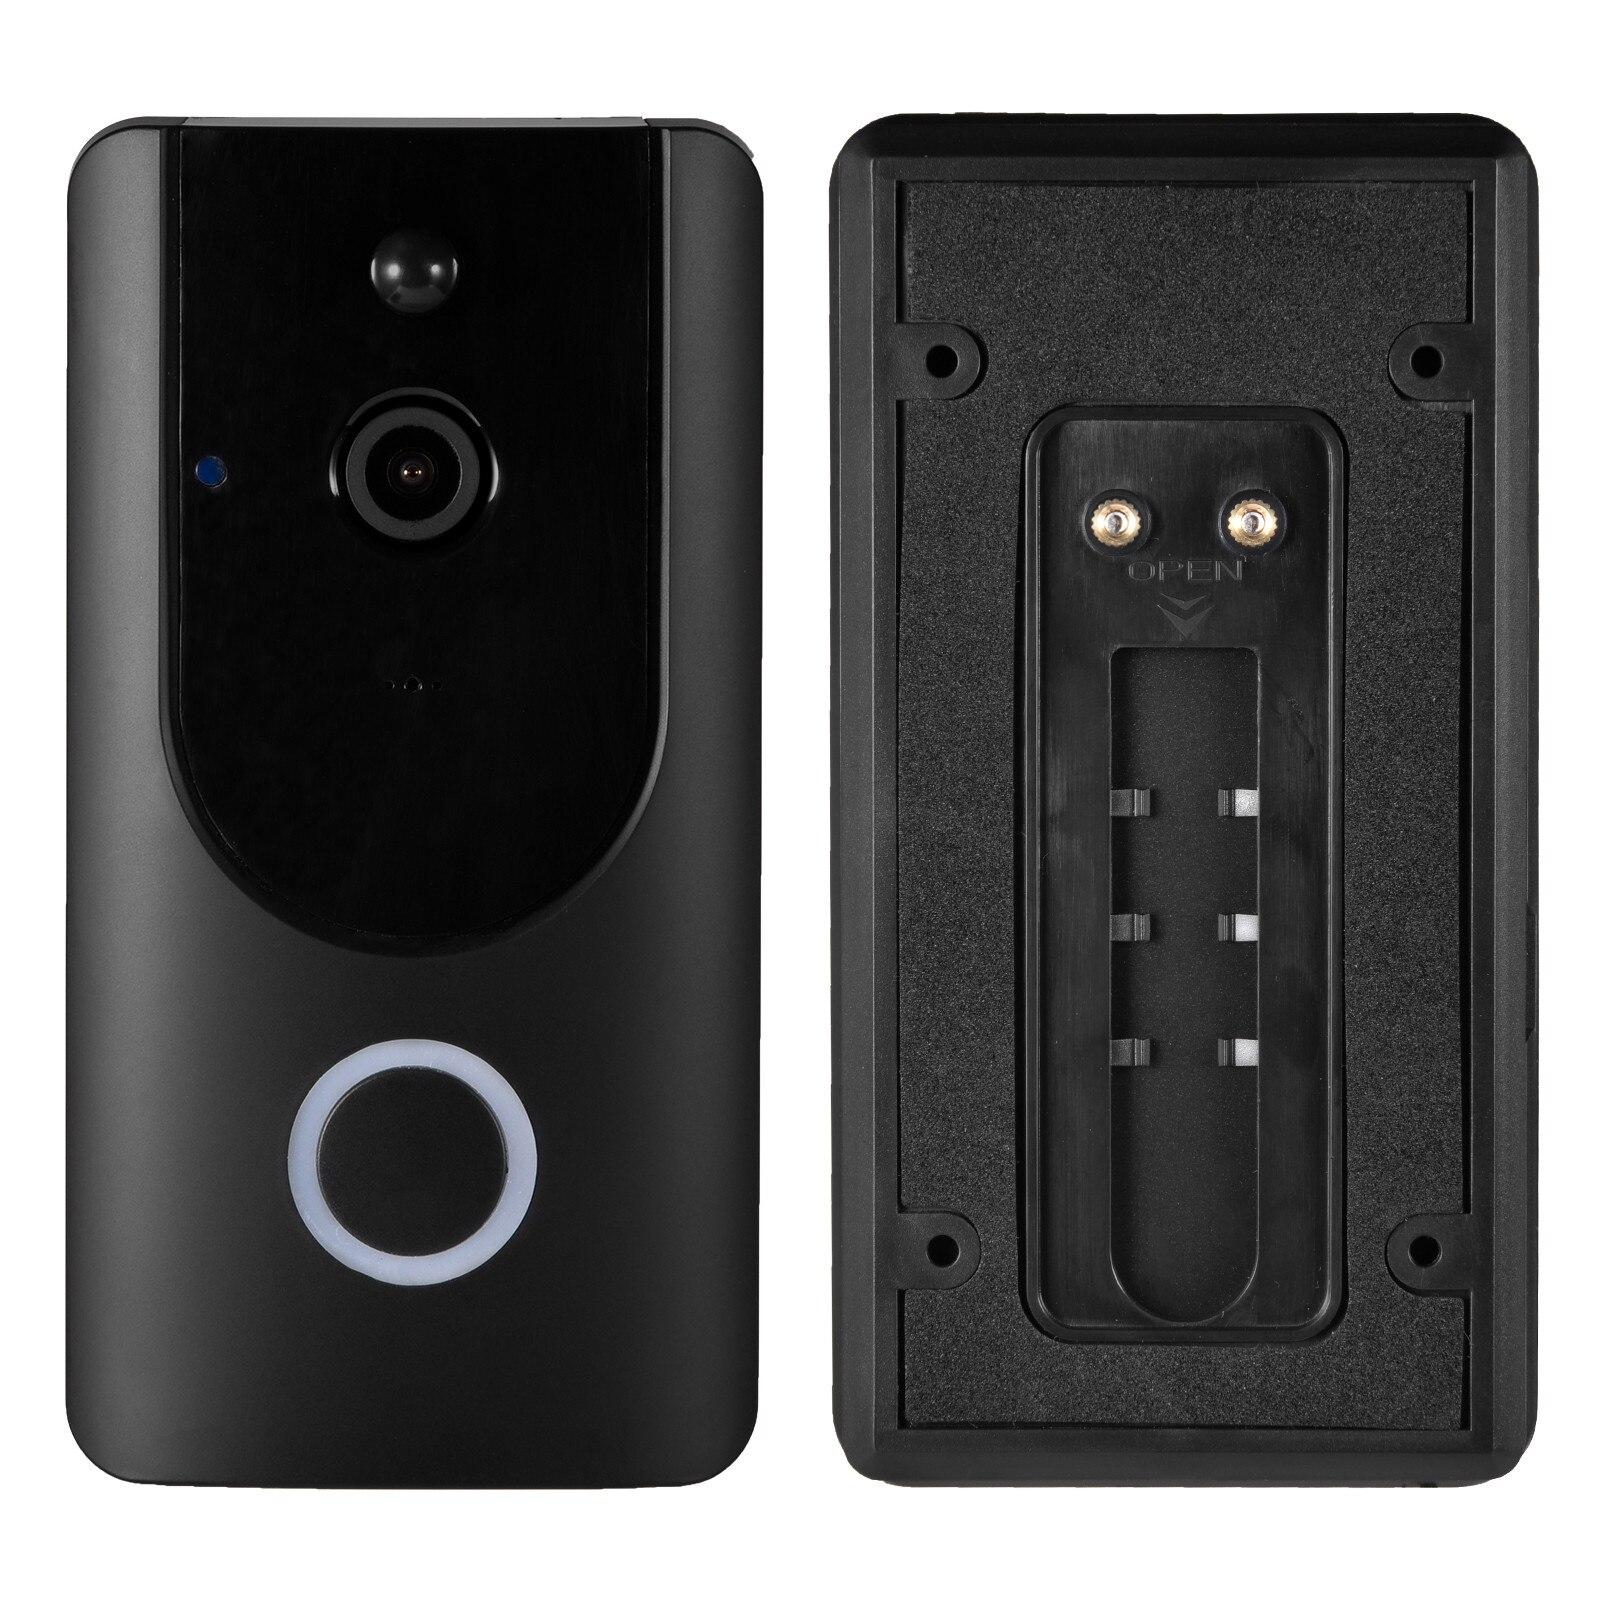 2021 HD Video Intercom Home Doorbell Smart Wireless Door Monitoring System Security Alarm Type Equipment 1080P APP Remote Record